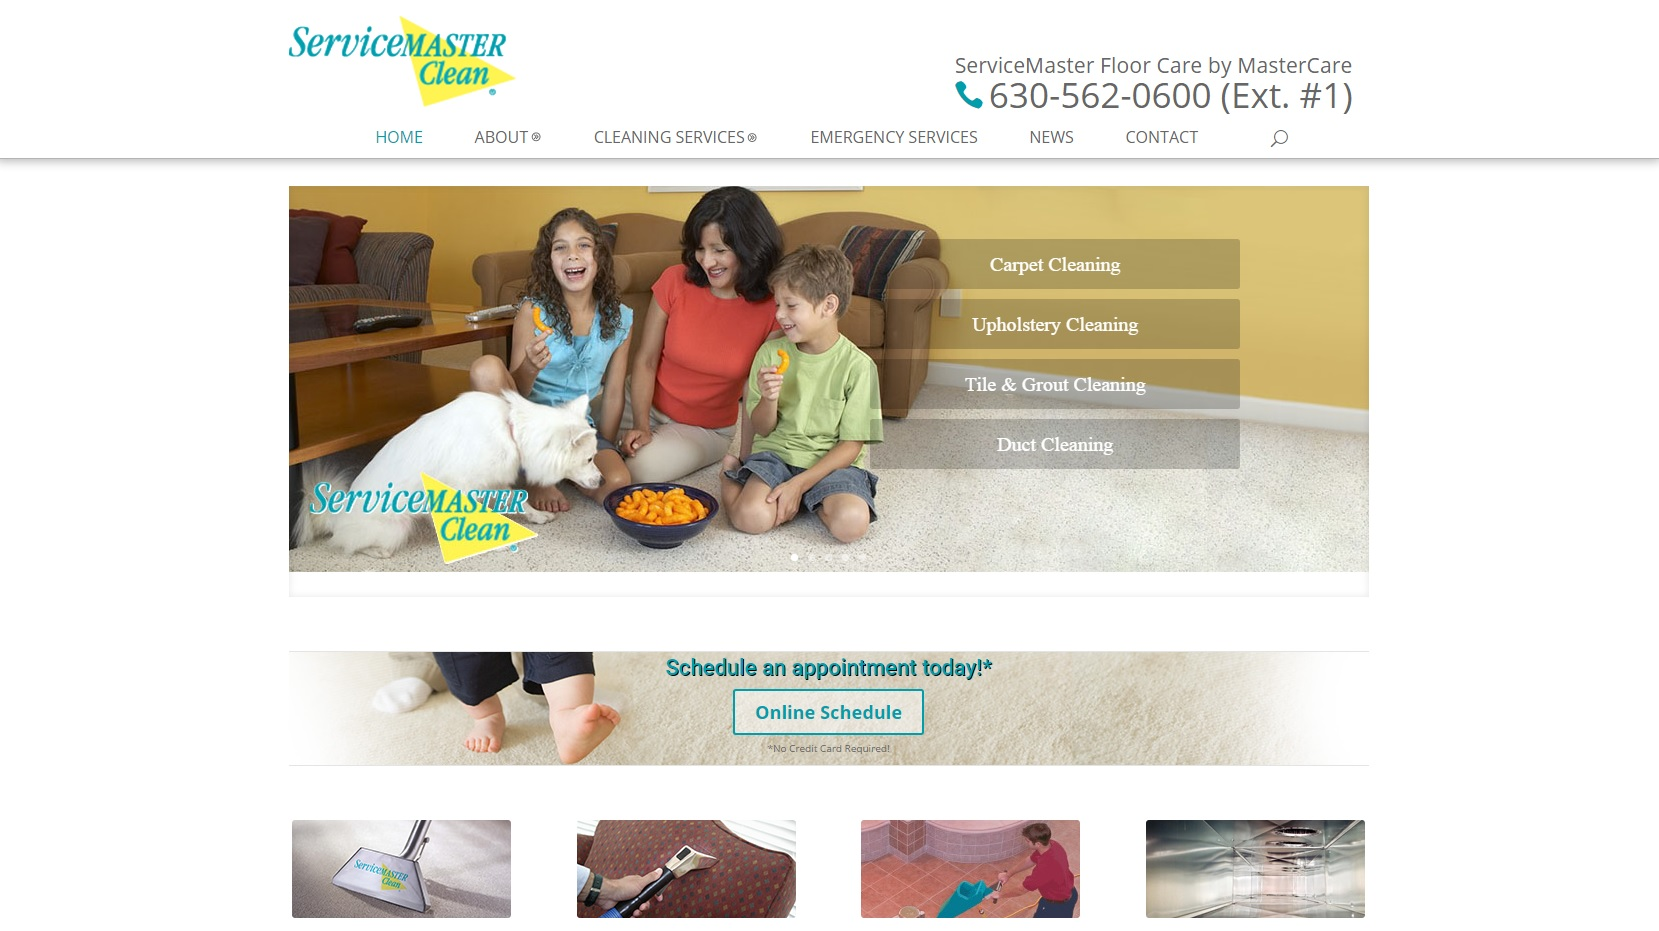 ServiceMaster Floor Care By MasterCare SEO amp Web Design